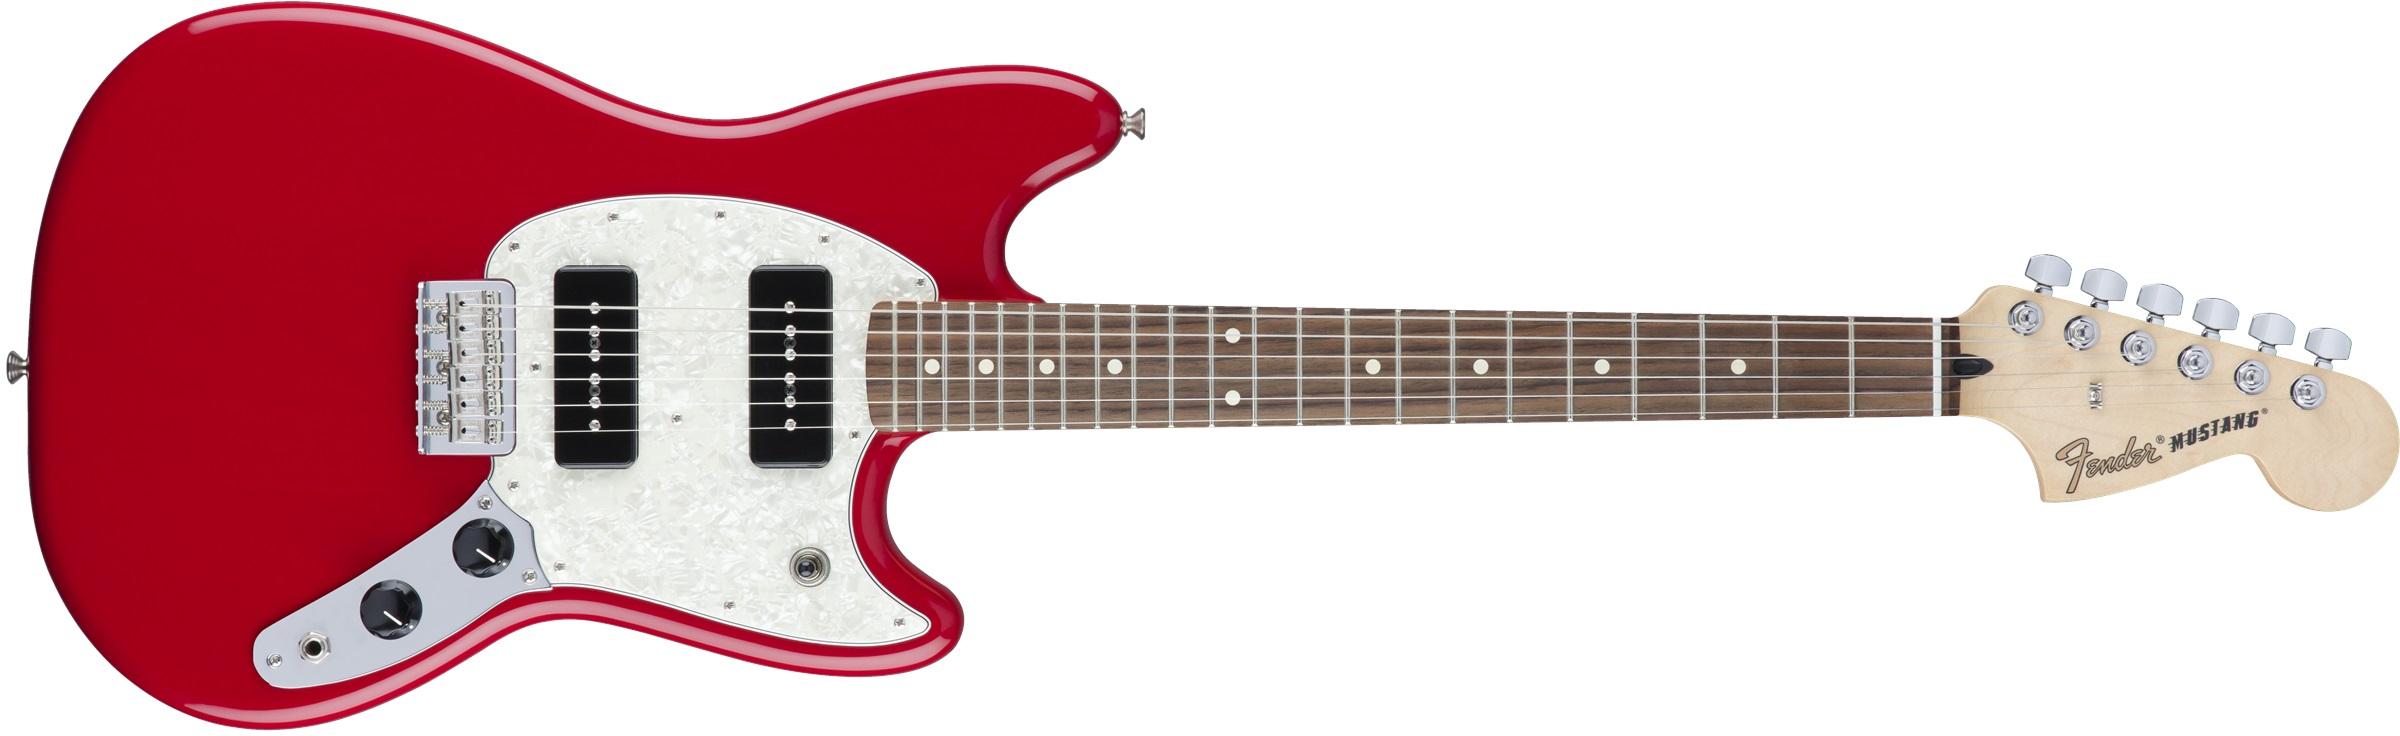 Fender Mustang P90 RW TR